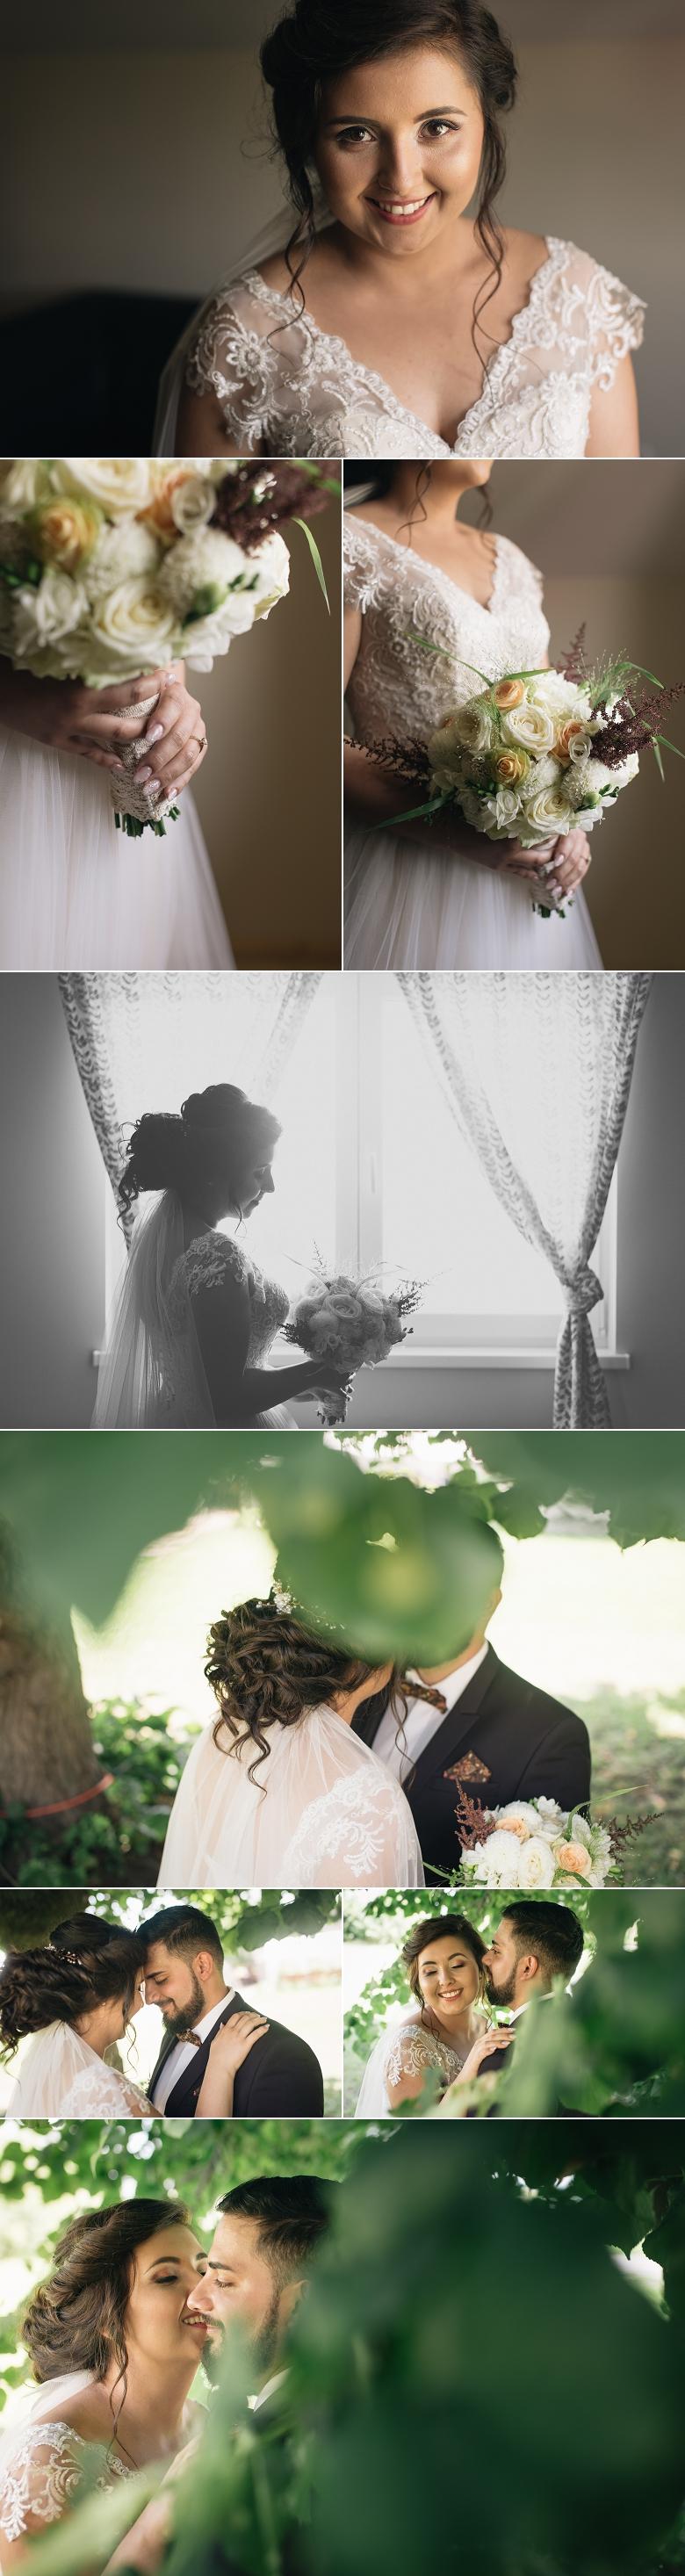 fotograf_nunta_brasov_poze_nunta-5